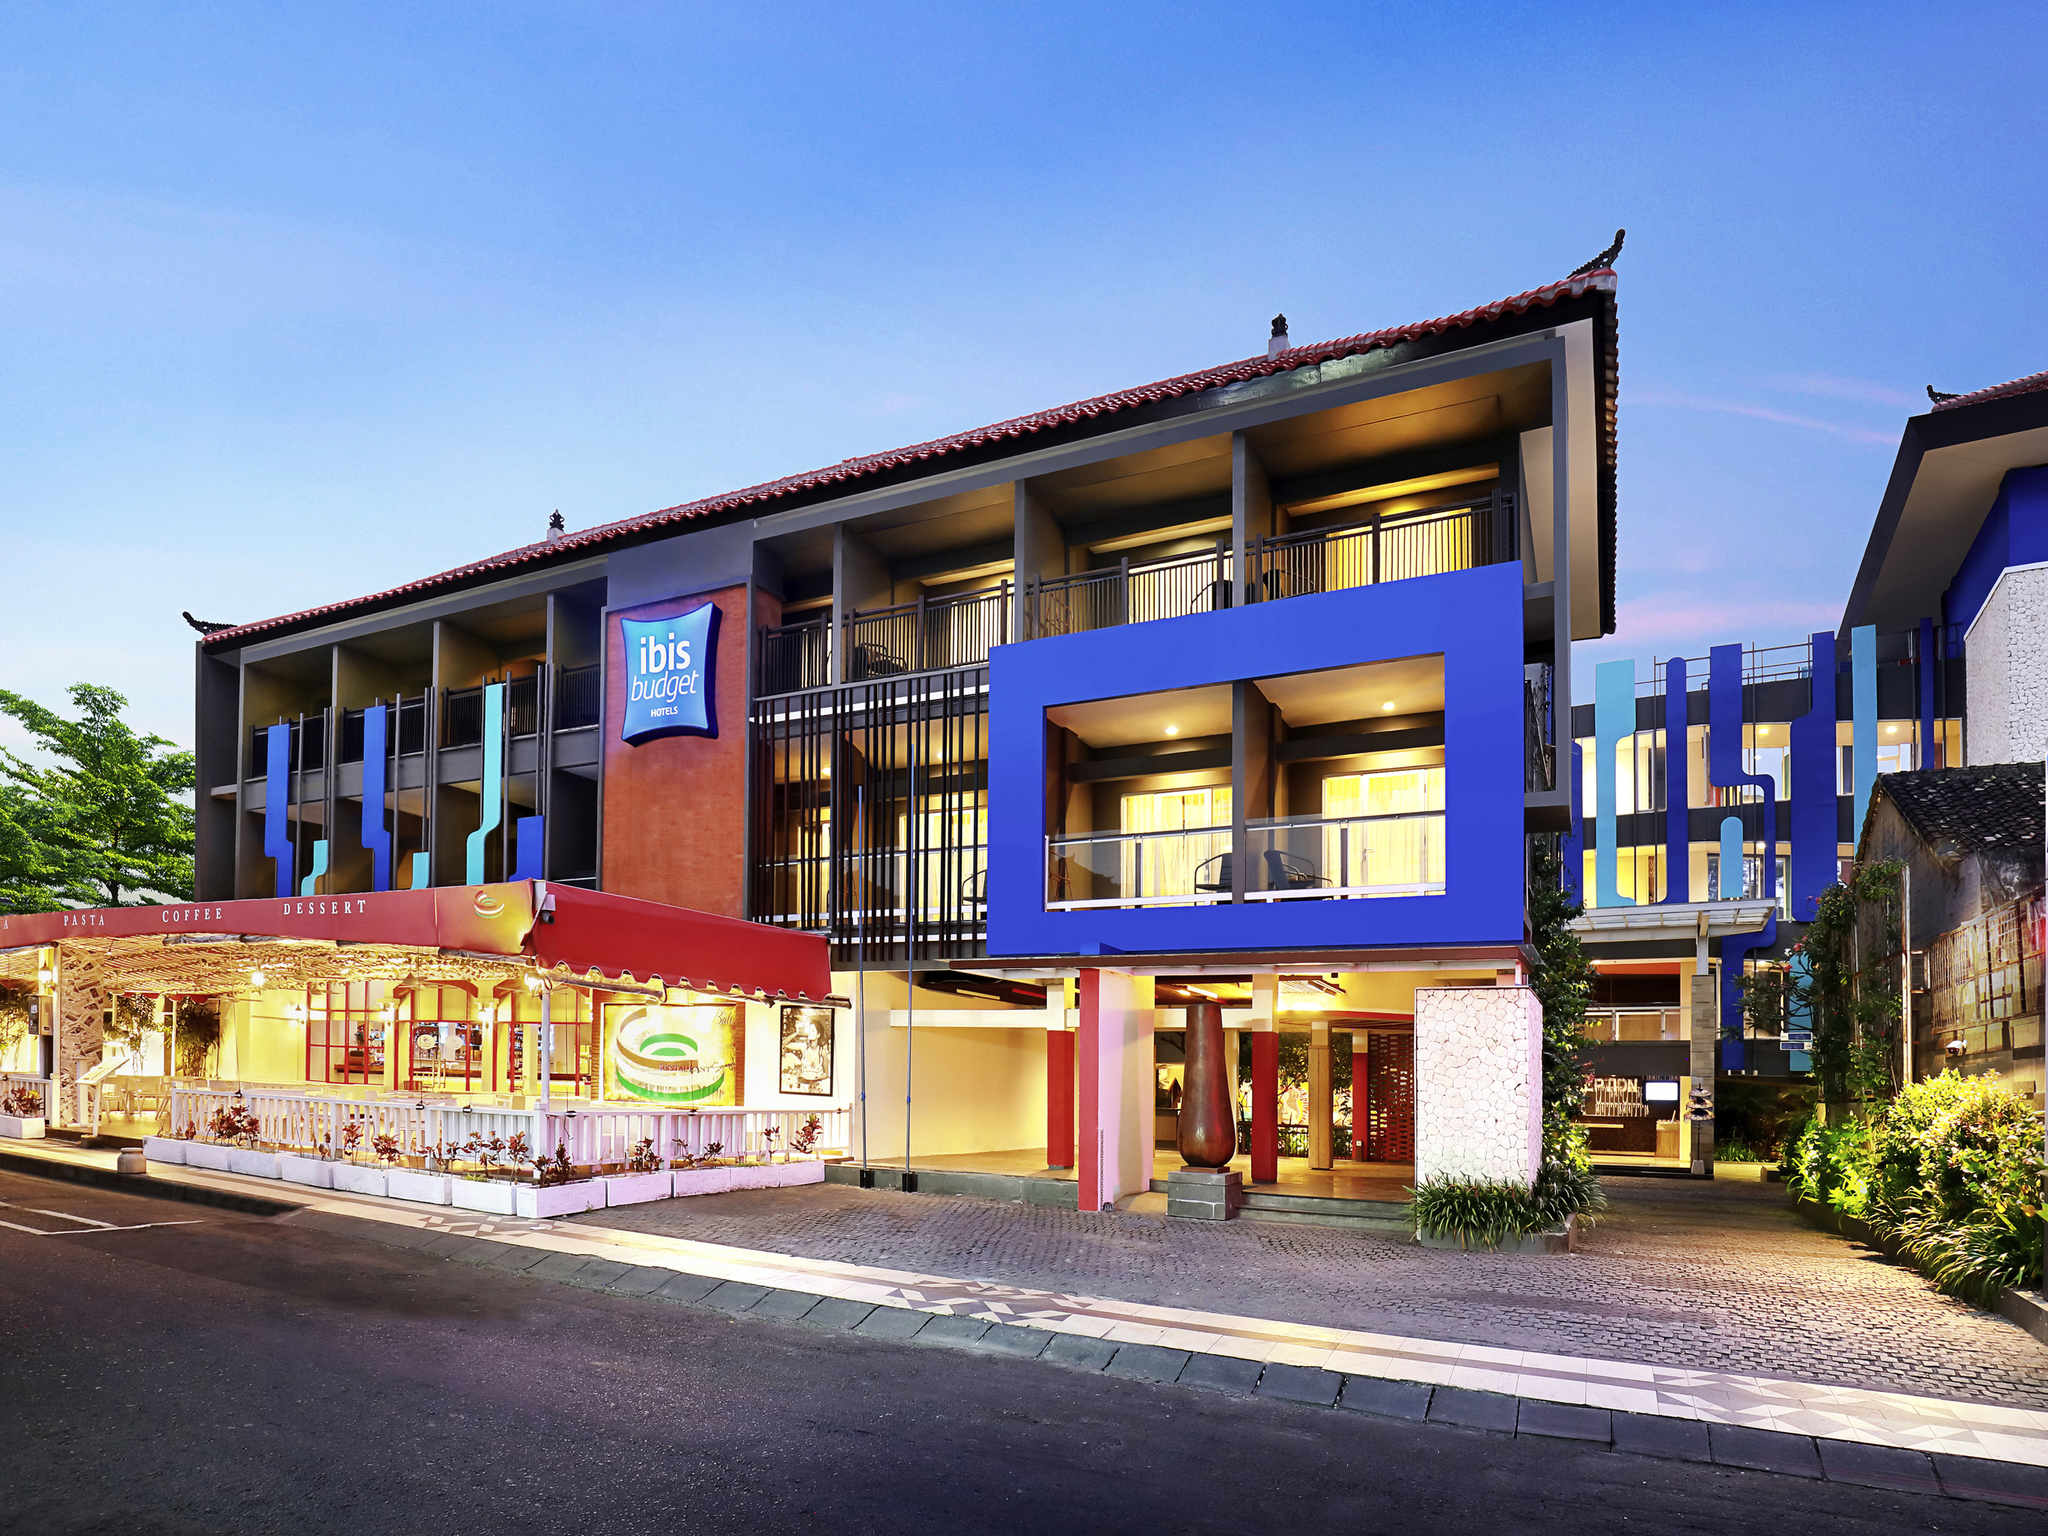 Hotel - Hotel Primera Seminyak managed by AccorHotels